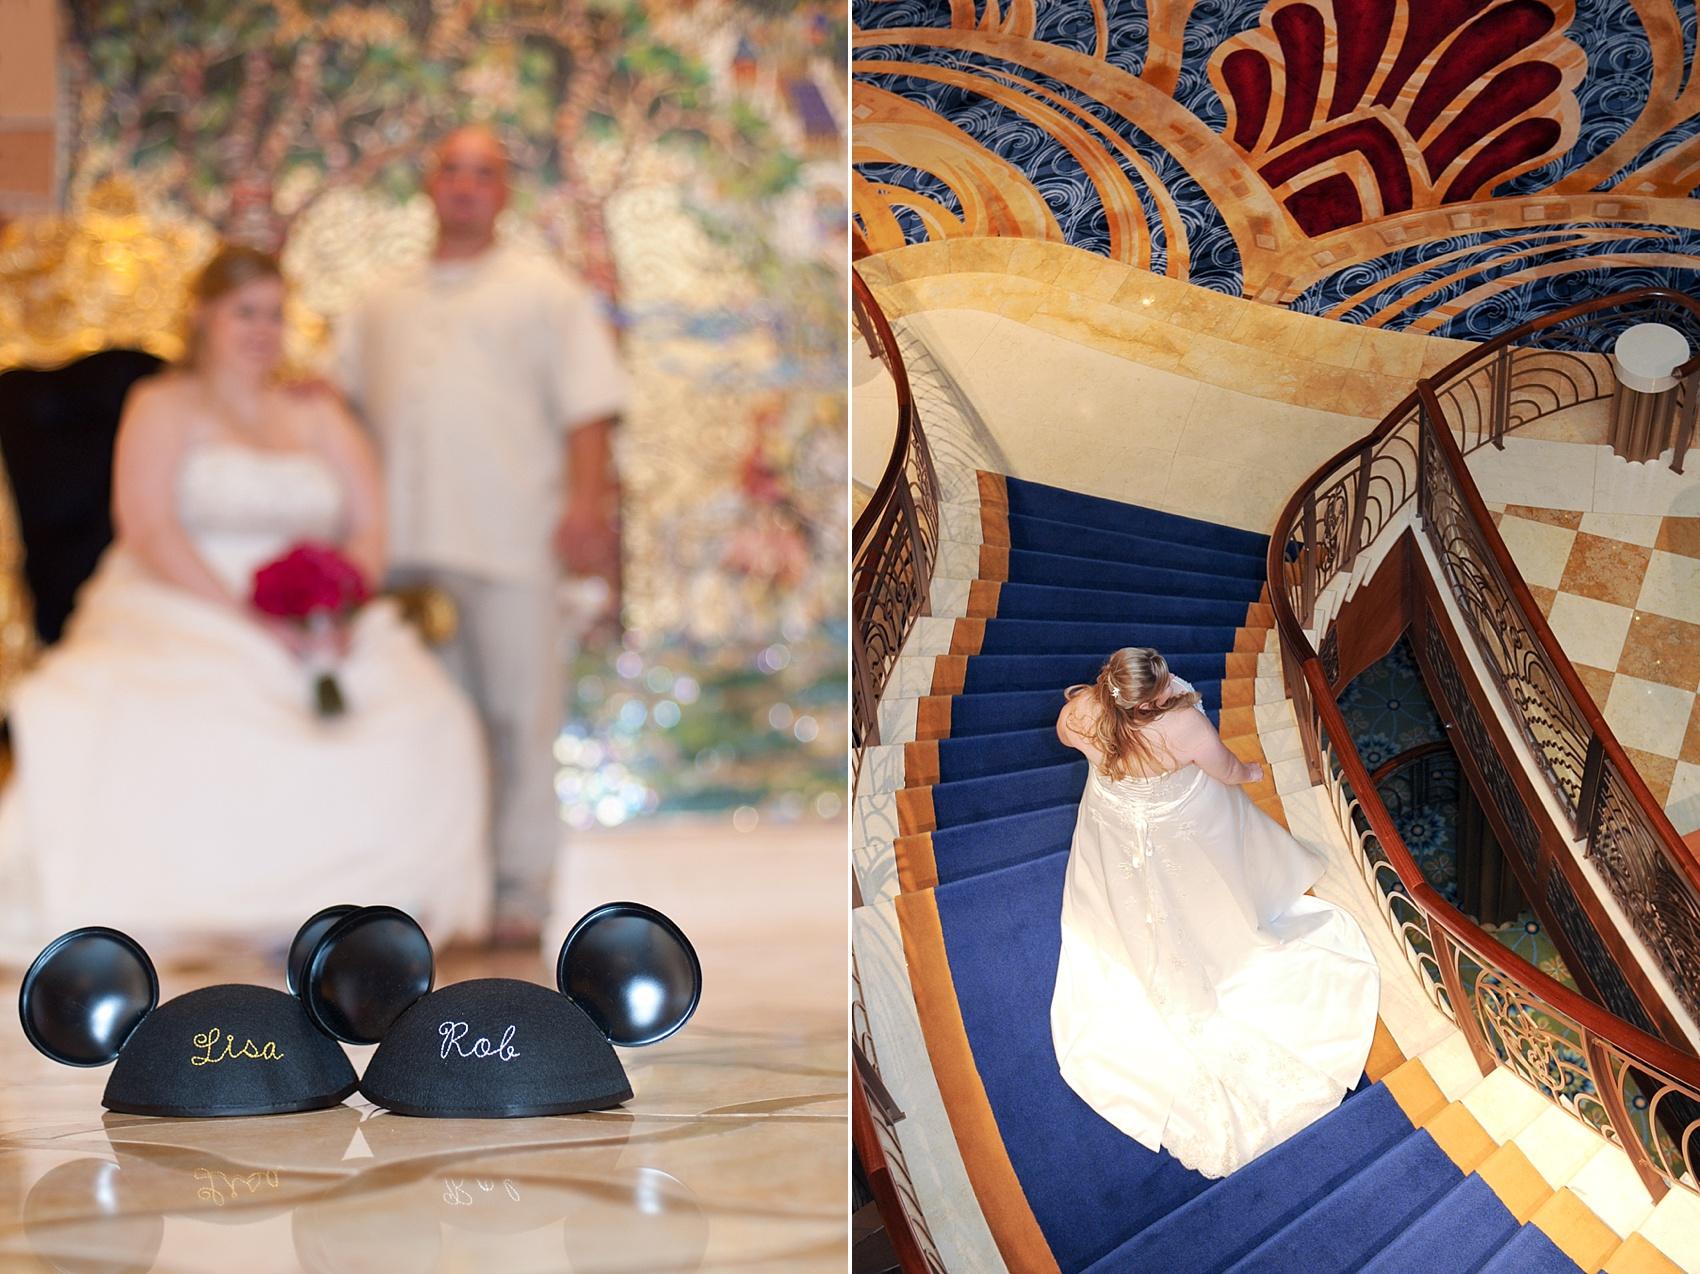 Disney Cruise Wedding.Disney Cruise Line Wedding Photos Caribbean And Castaway Cay